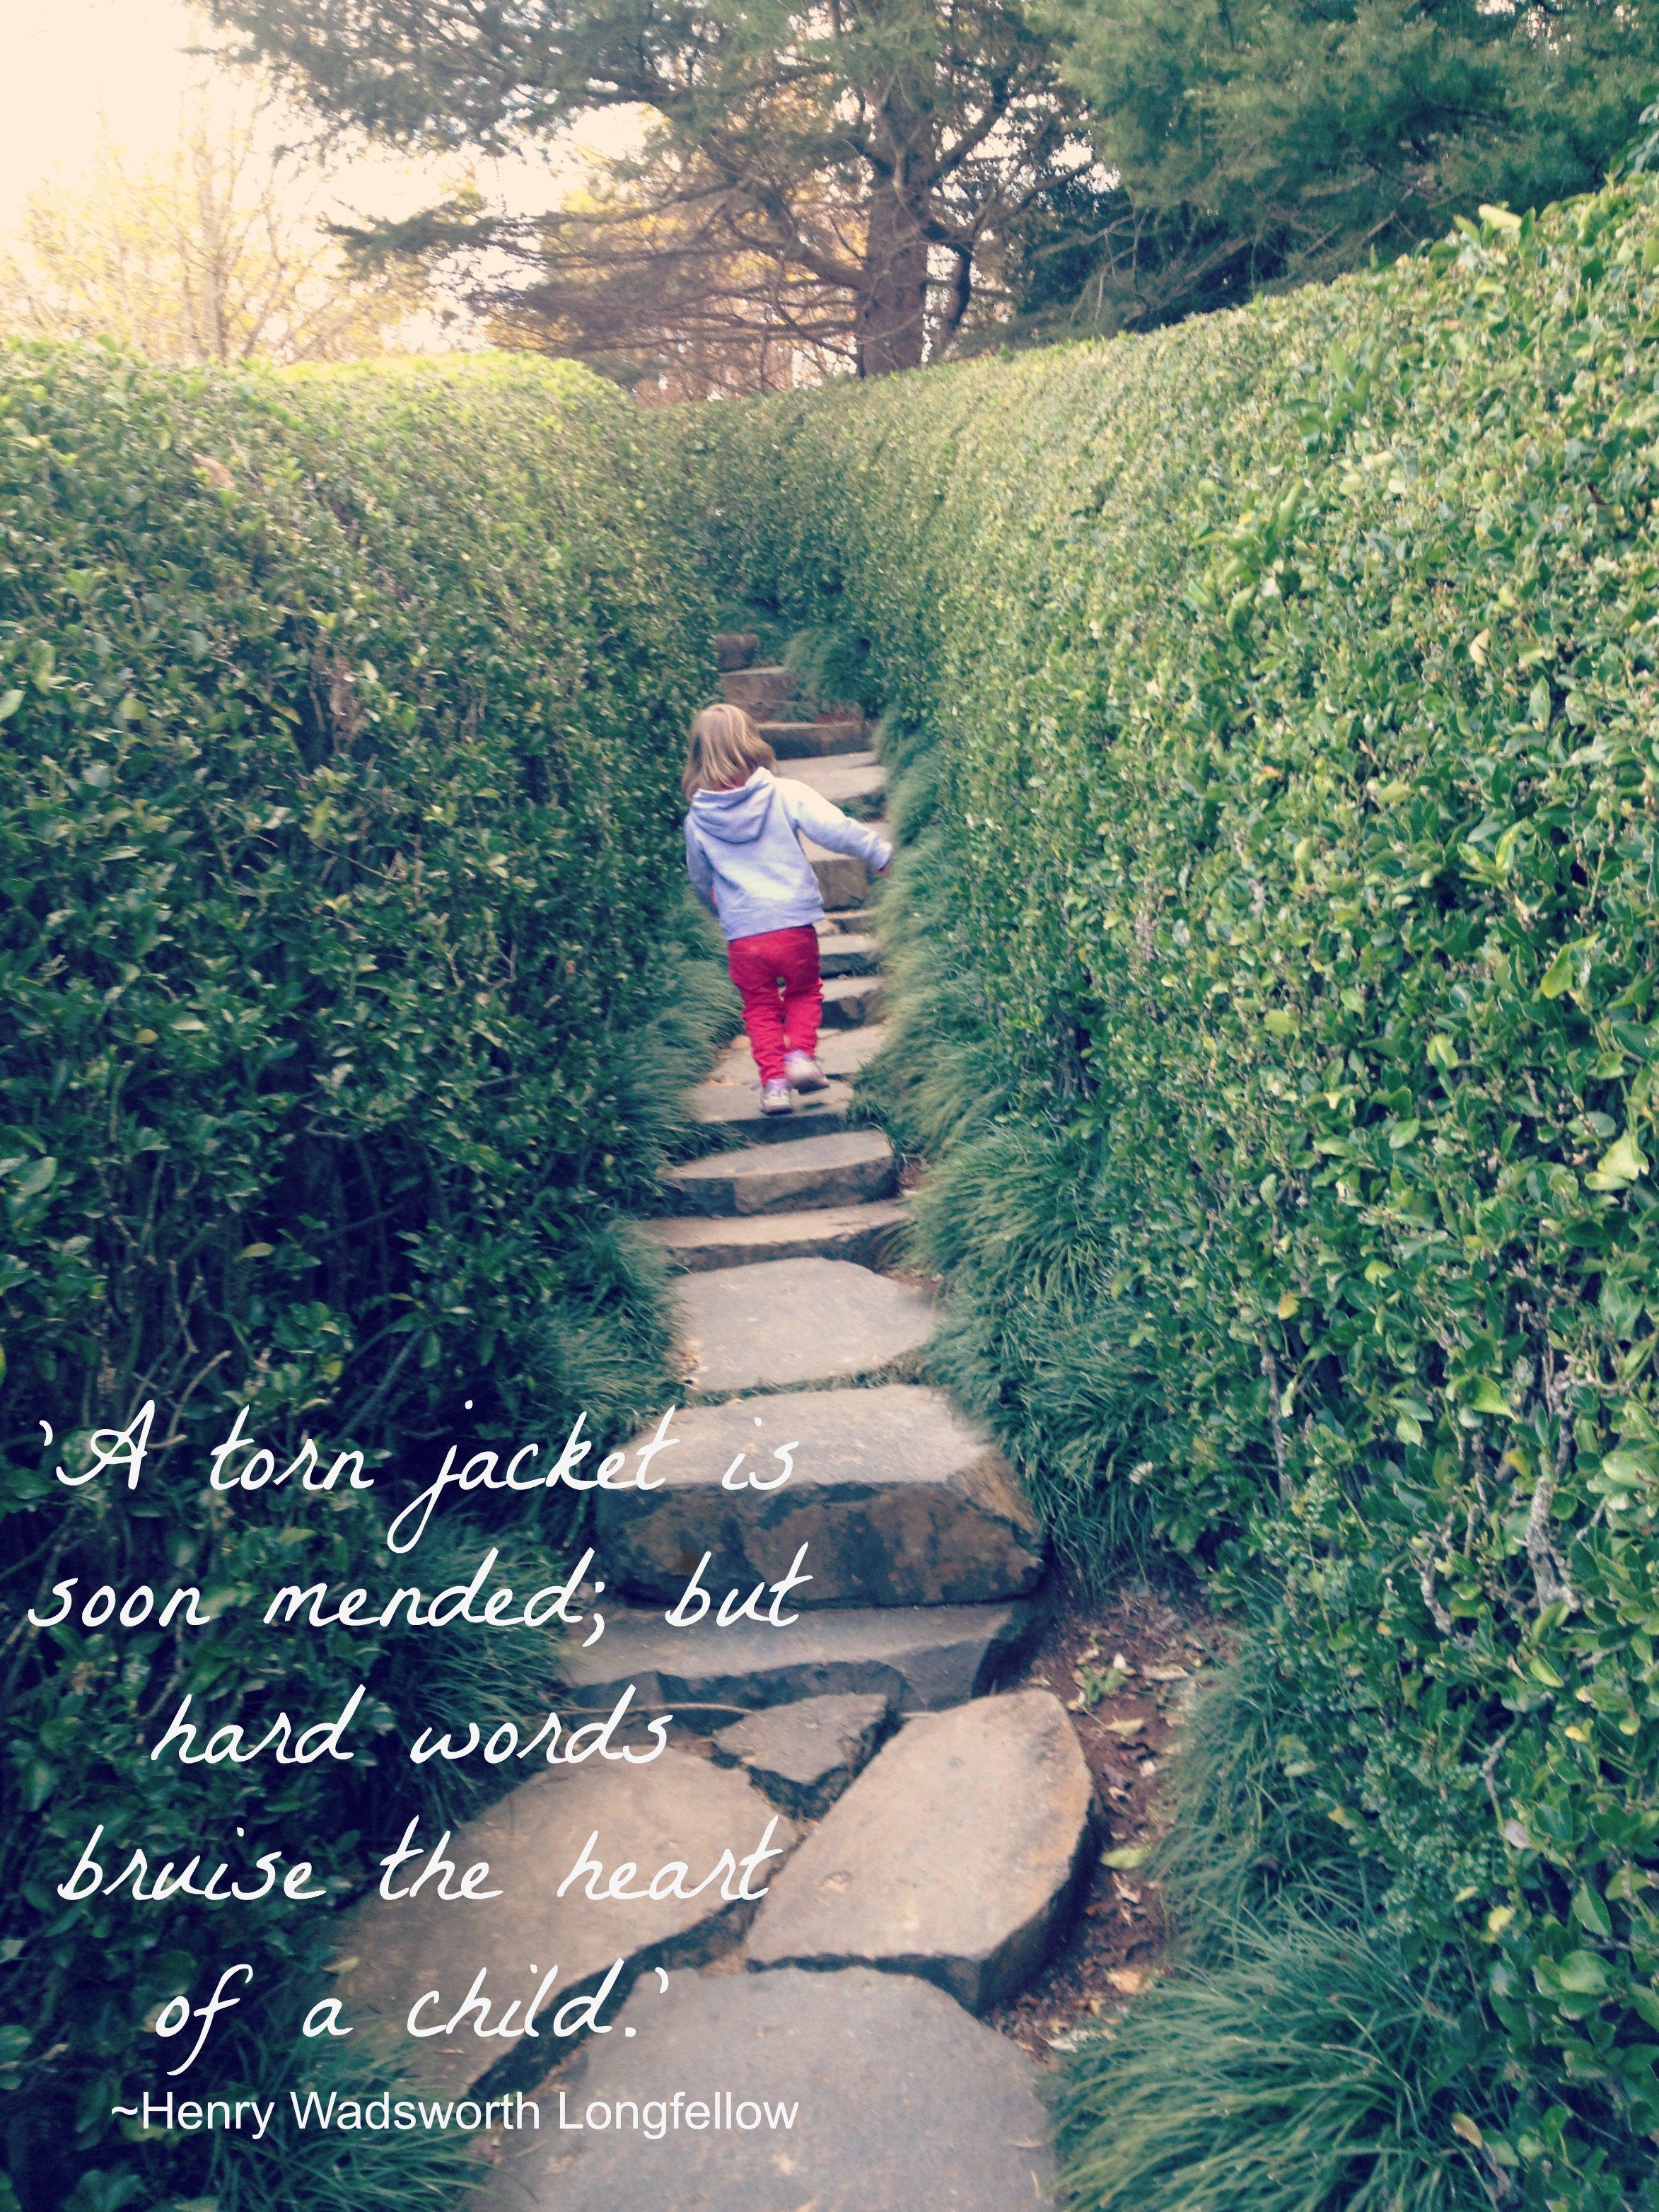 RIE parenting lesson